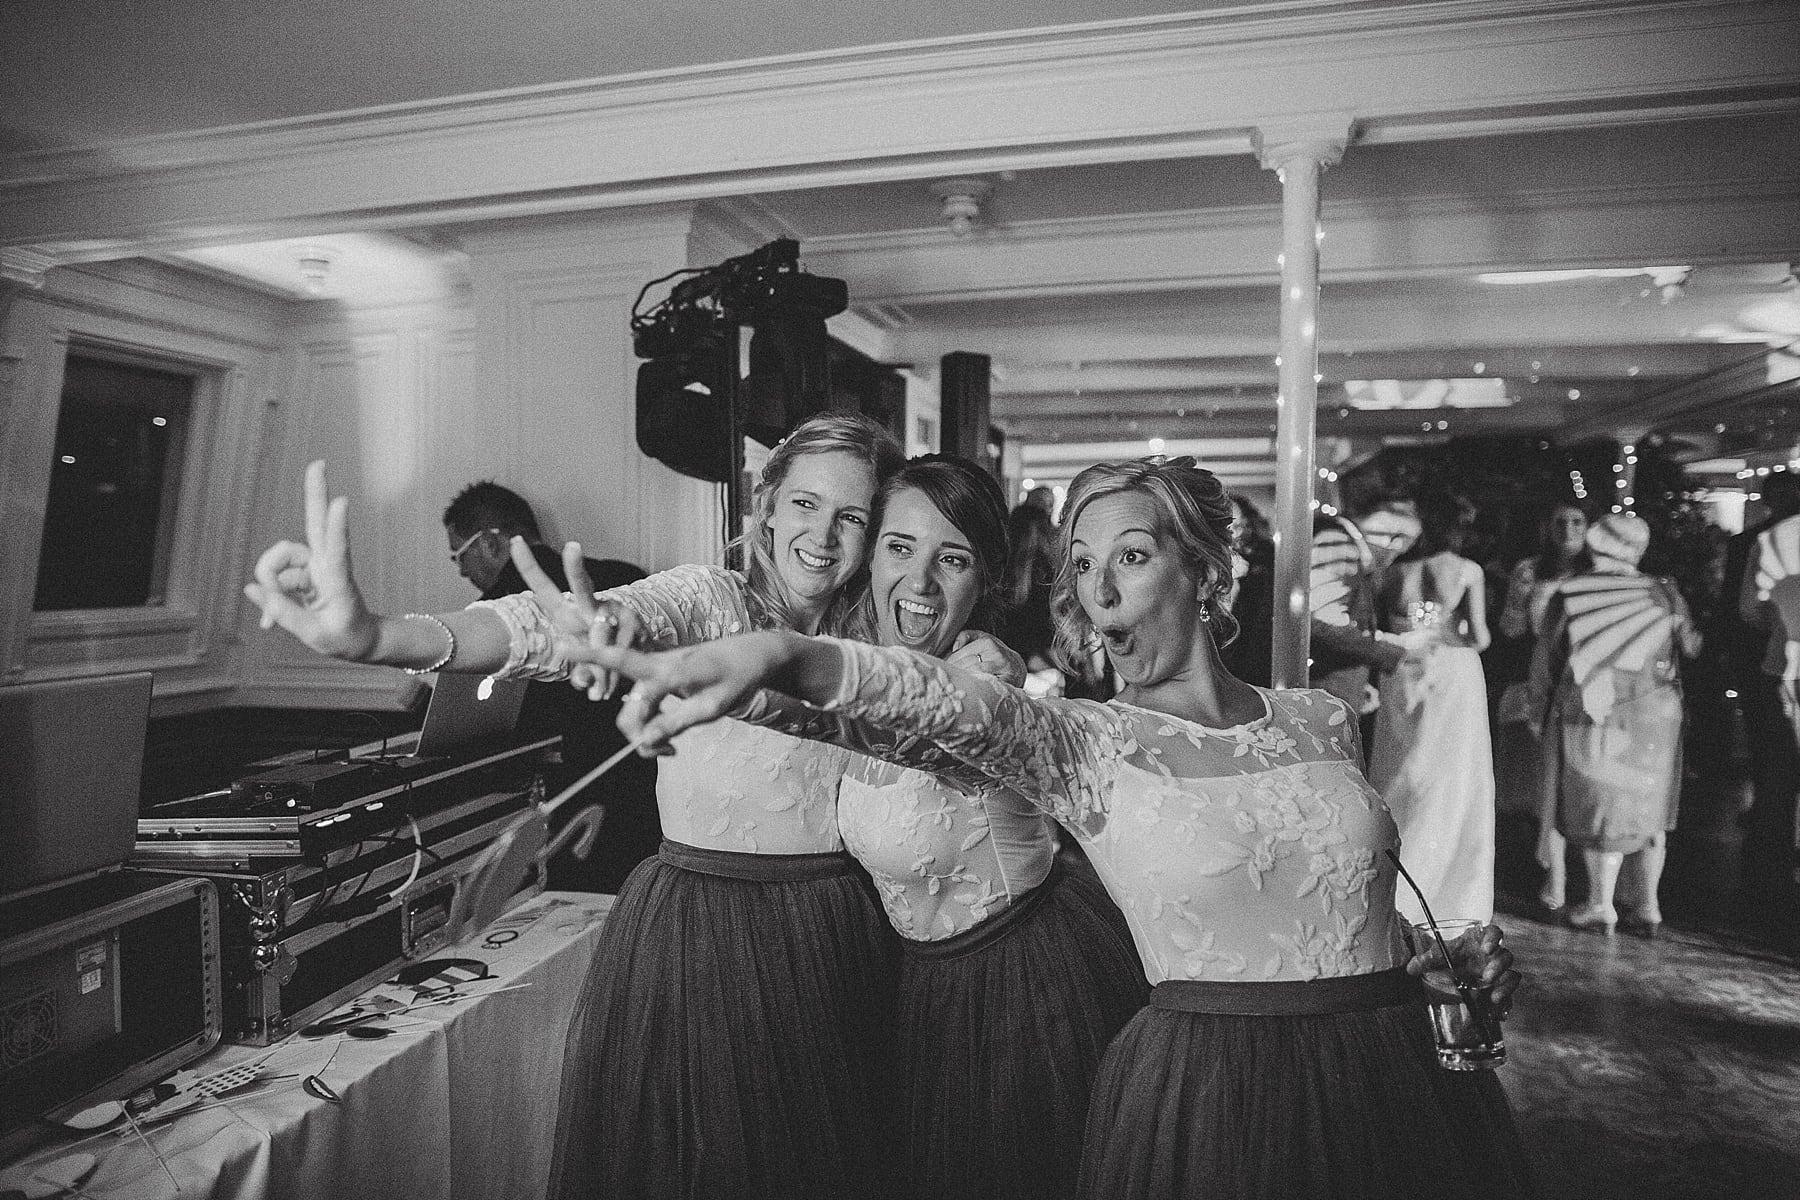 belfast wedding,titanic quarter,all aboard,ss nomadic,northern ireland wedding photographer,dancing,bright,fun,colourful,wedding photo inspiration,